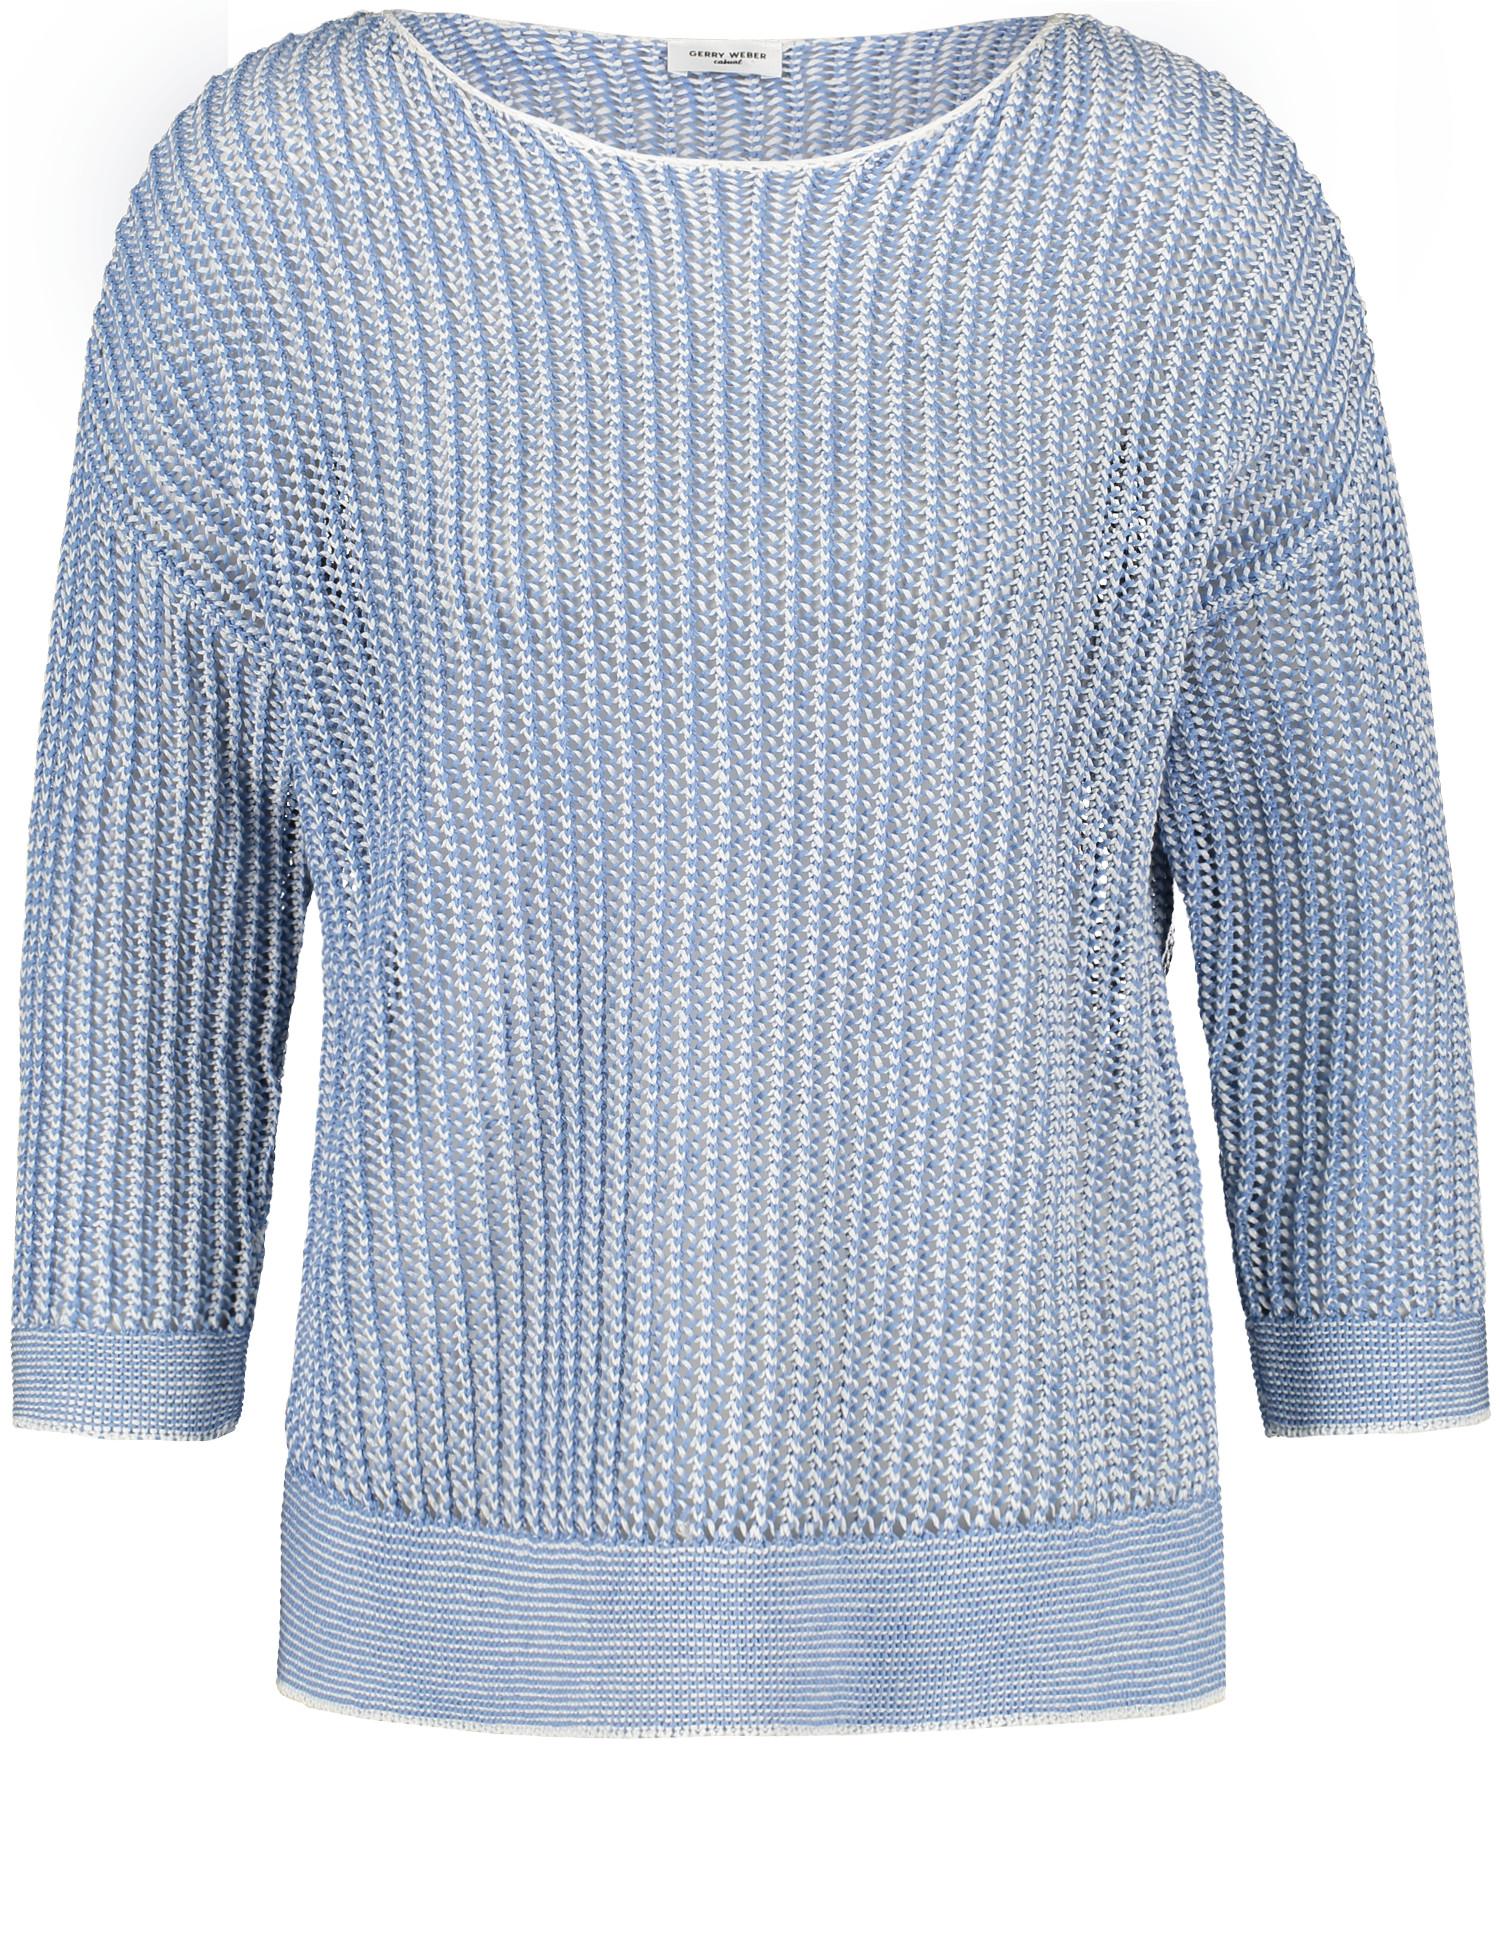 Pullover GERRY WEBER, blau